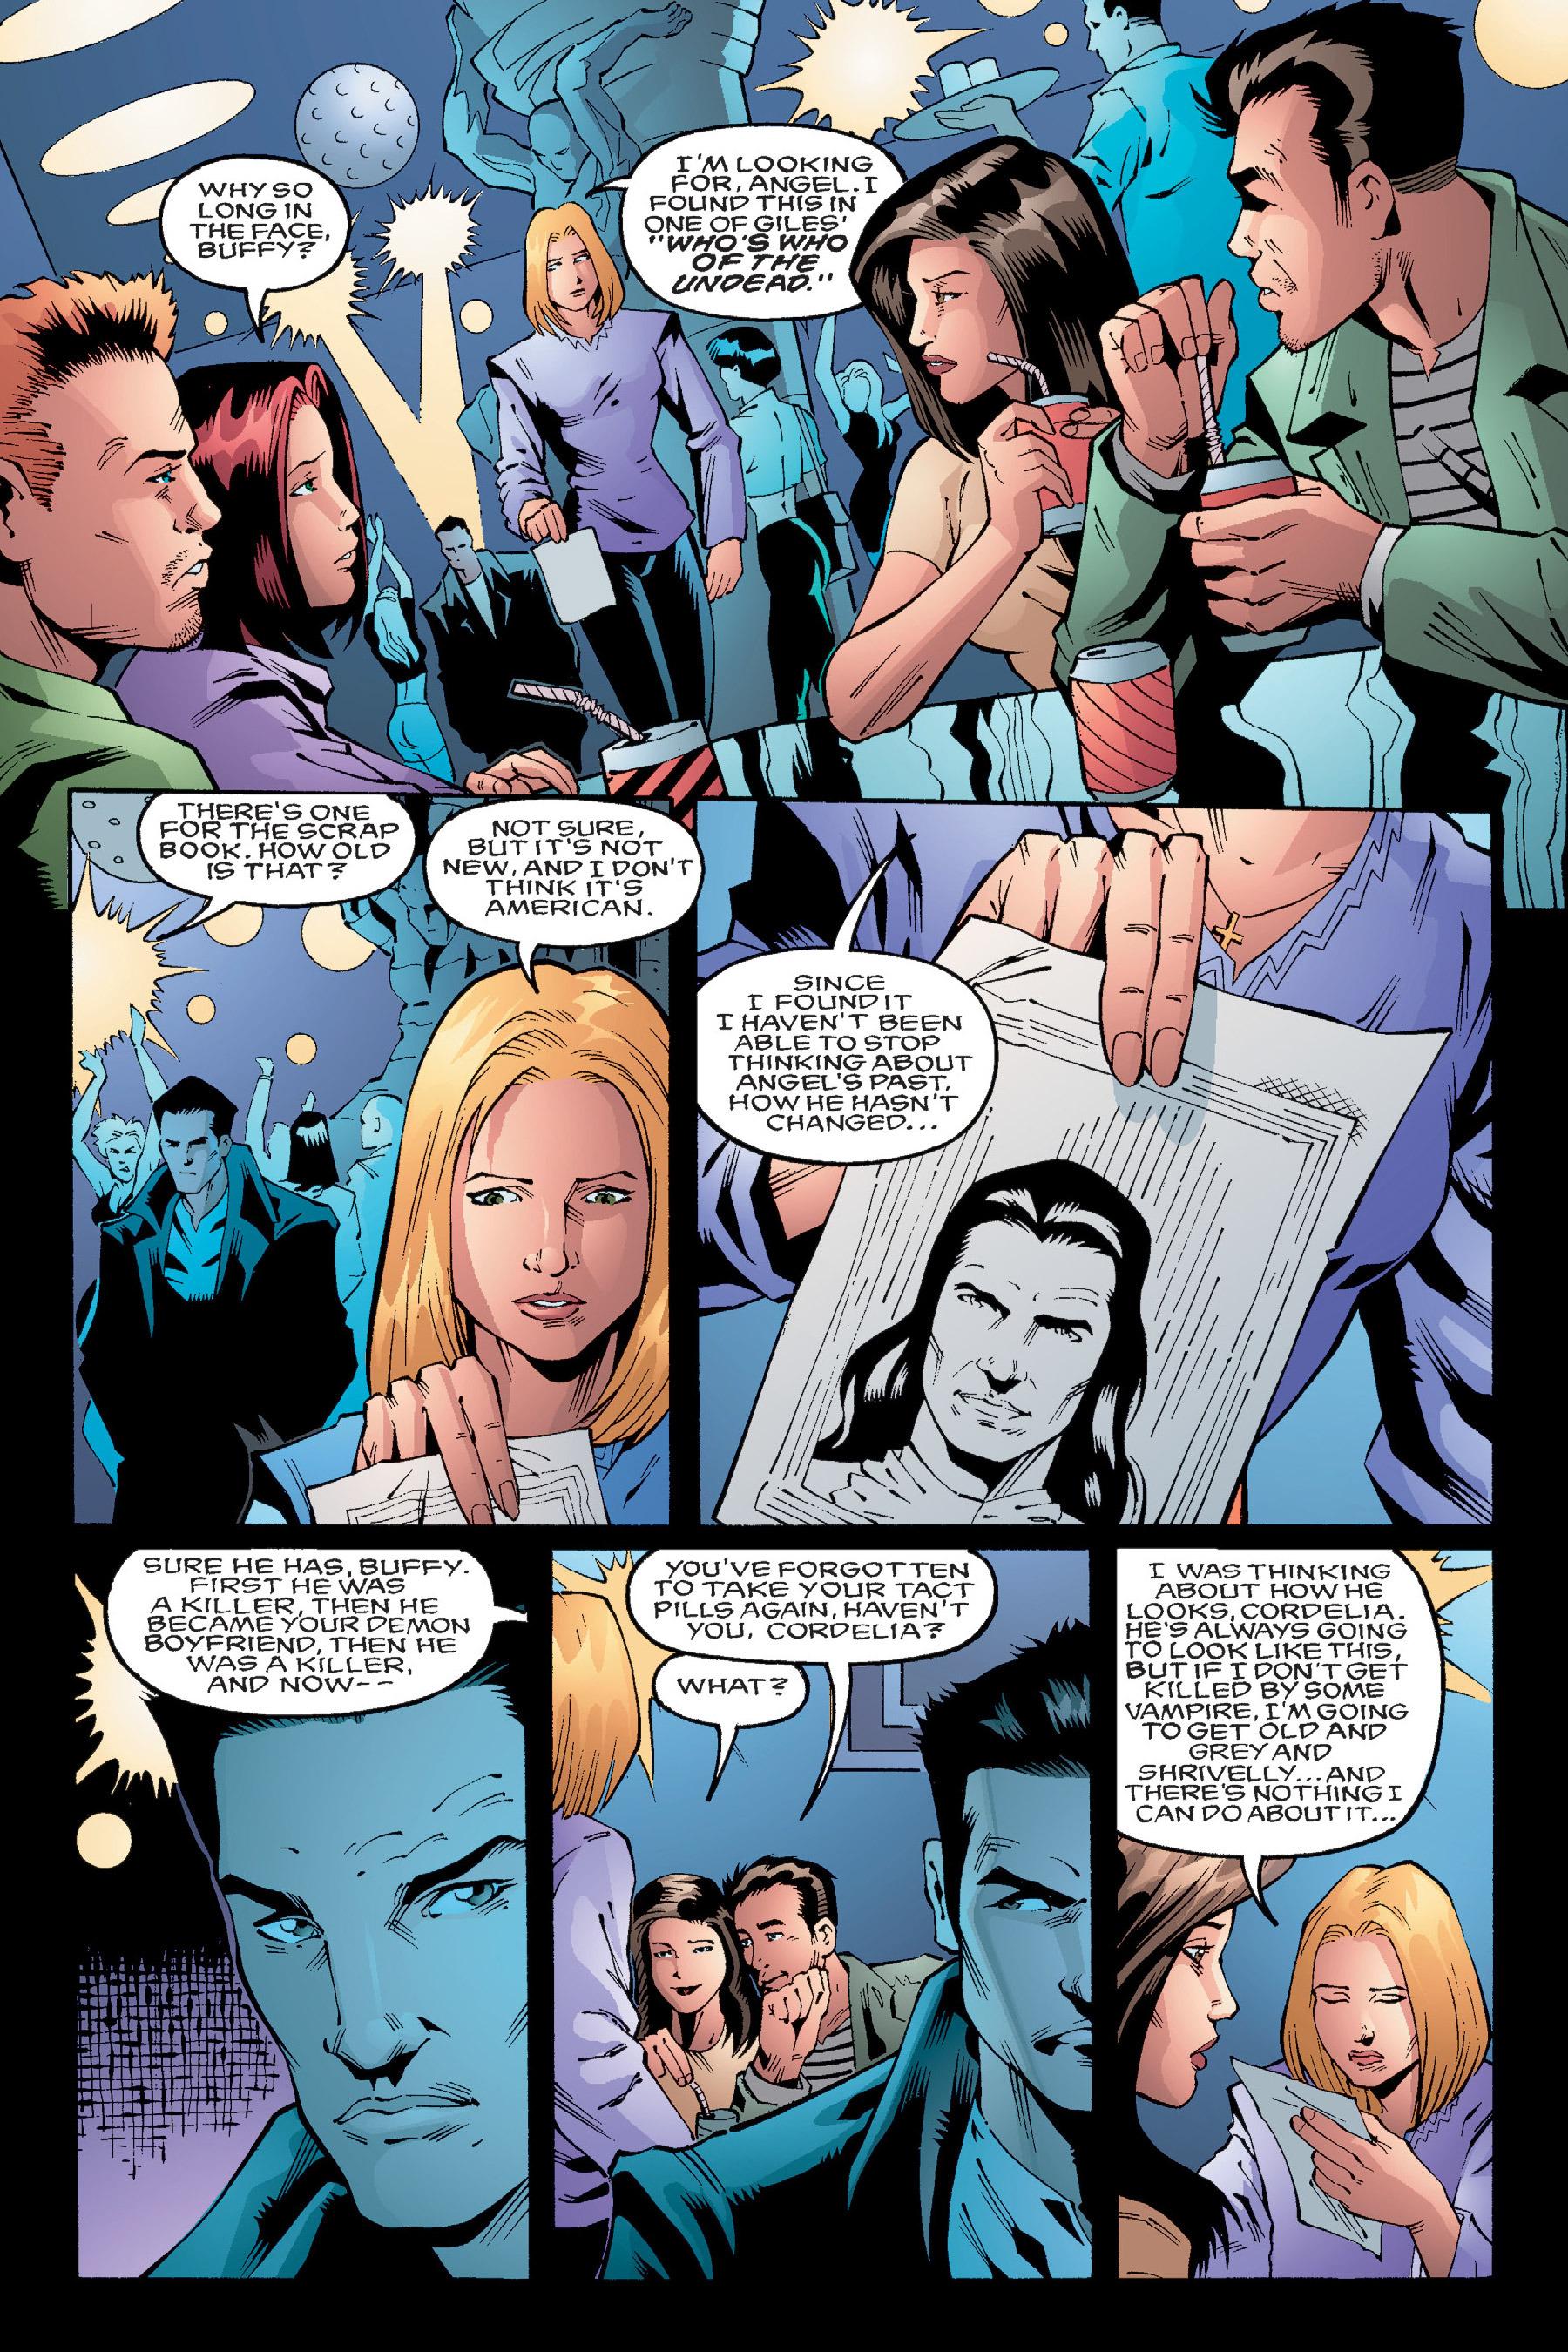 Read online Buffy the Vampire Slayer: Omnibus comic -  Issue # TPB 4 - 30